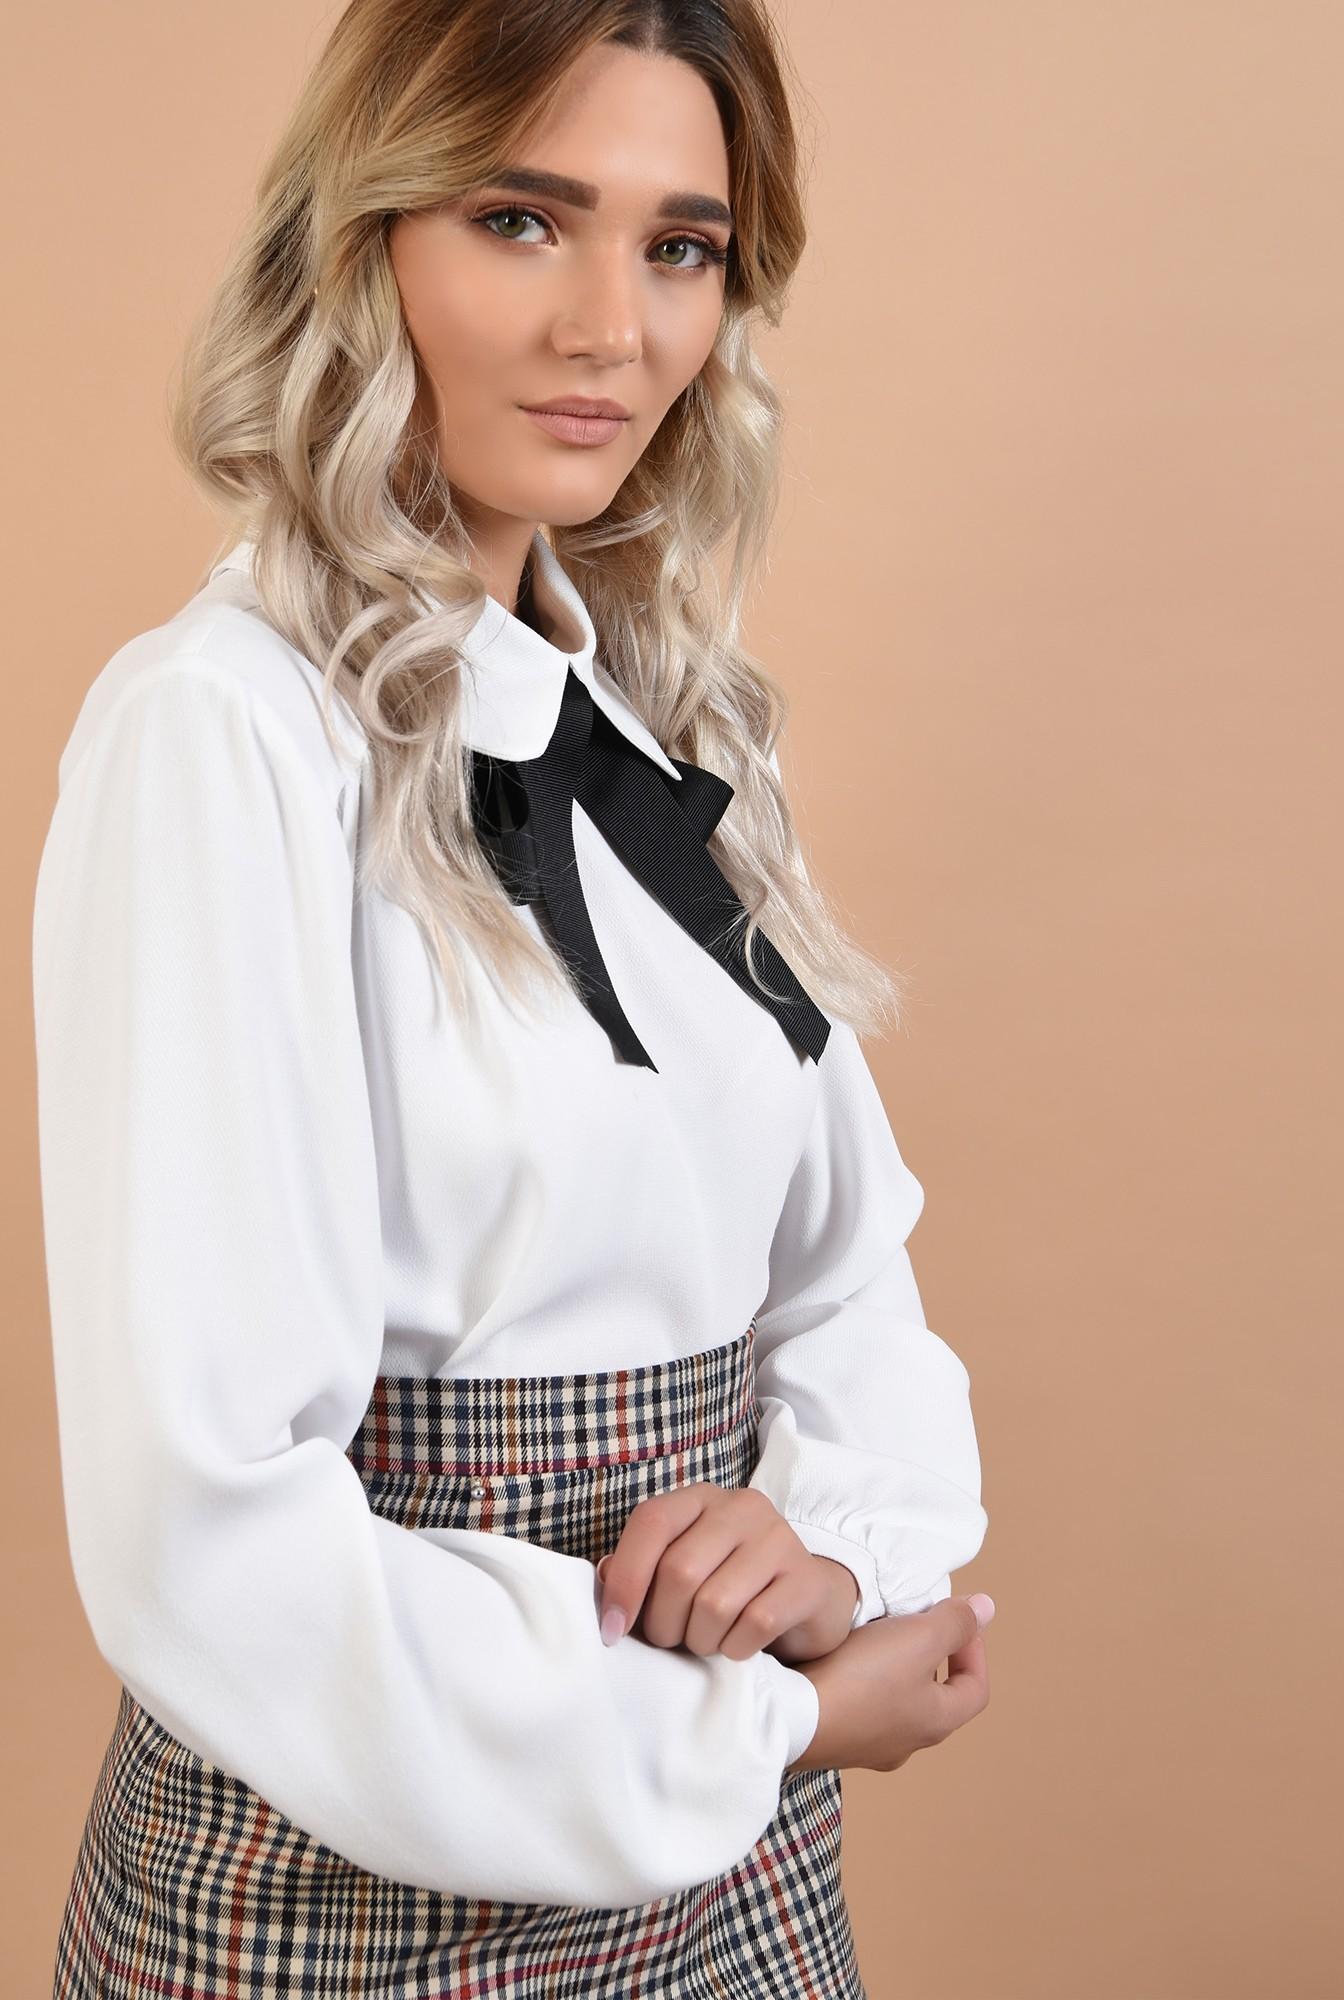 2 - bluza cu funda, Poema, alb-negru, maneci lungi bufante, office